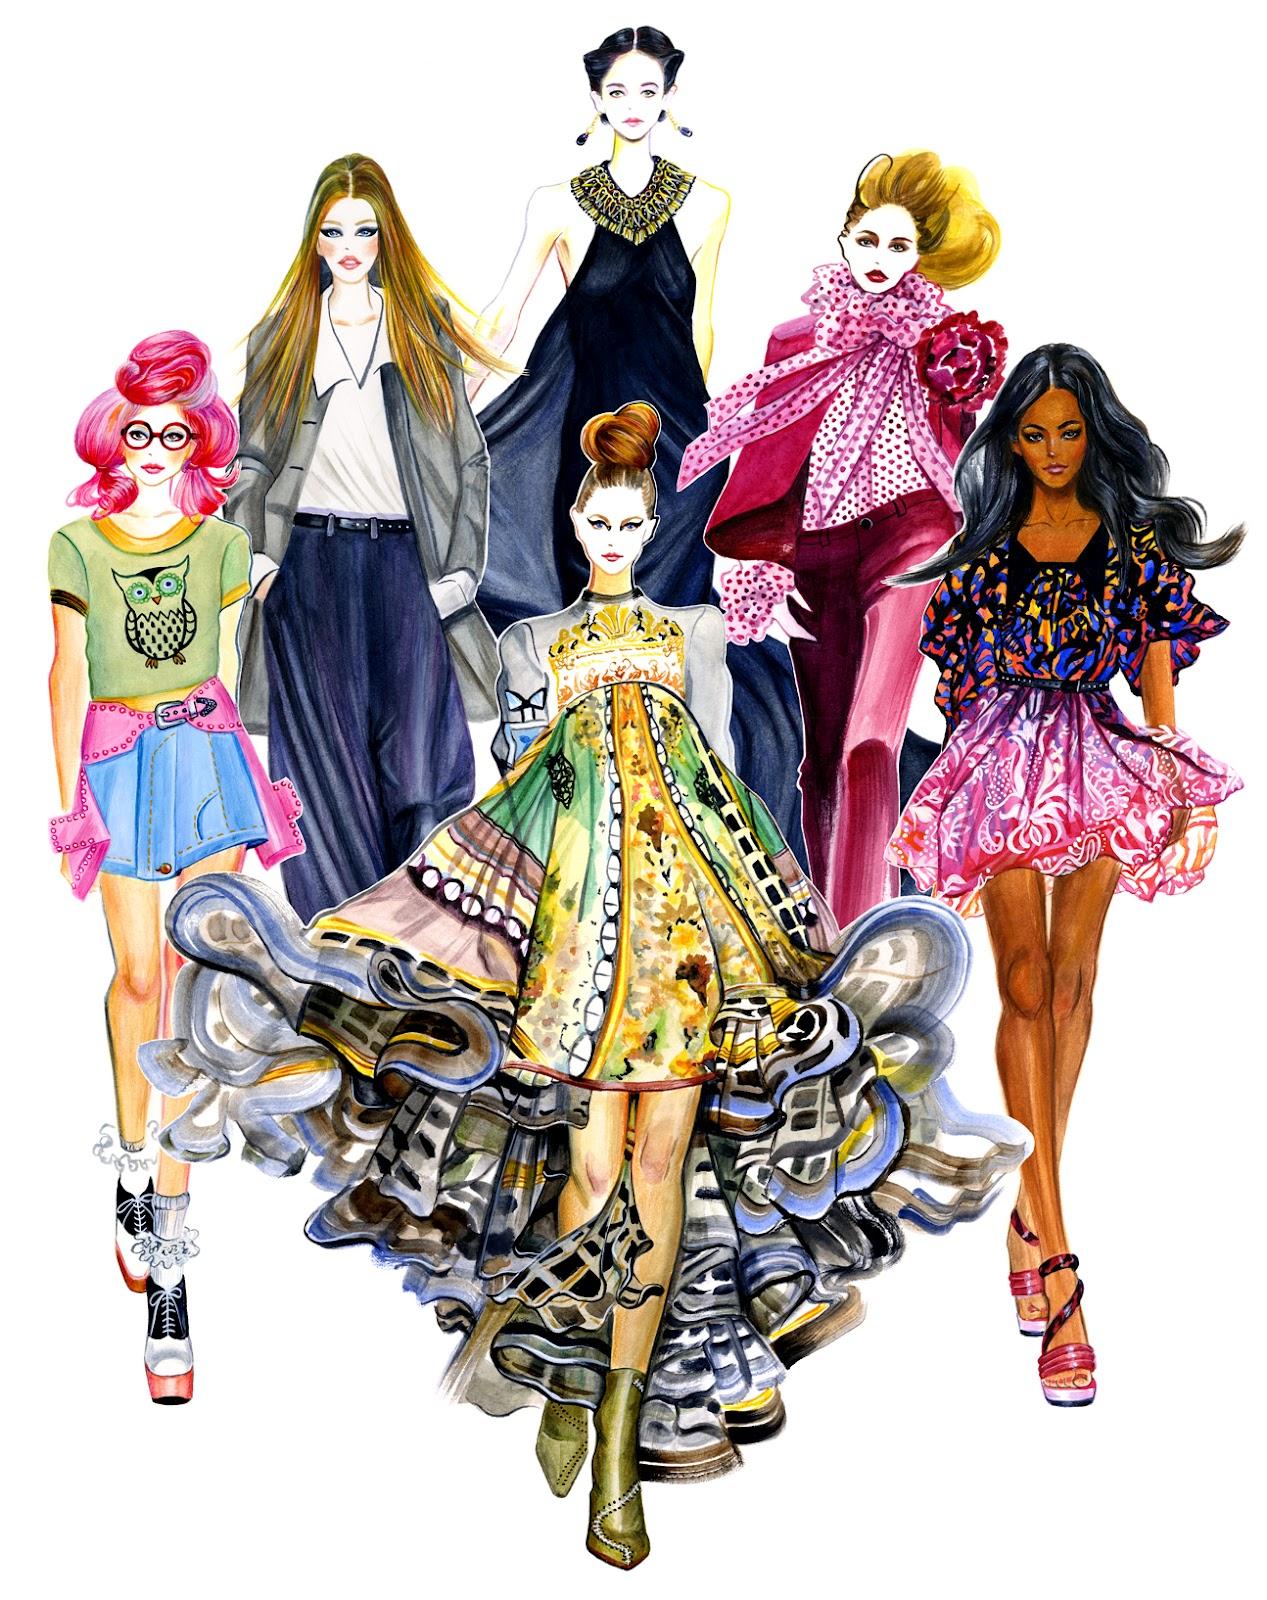 Fashion Illustration Royalty Free Stock Photo: Sunny Gu: Girls In Style